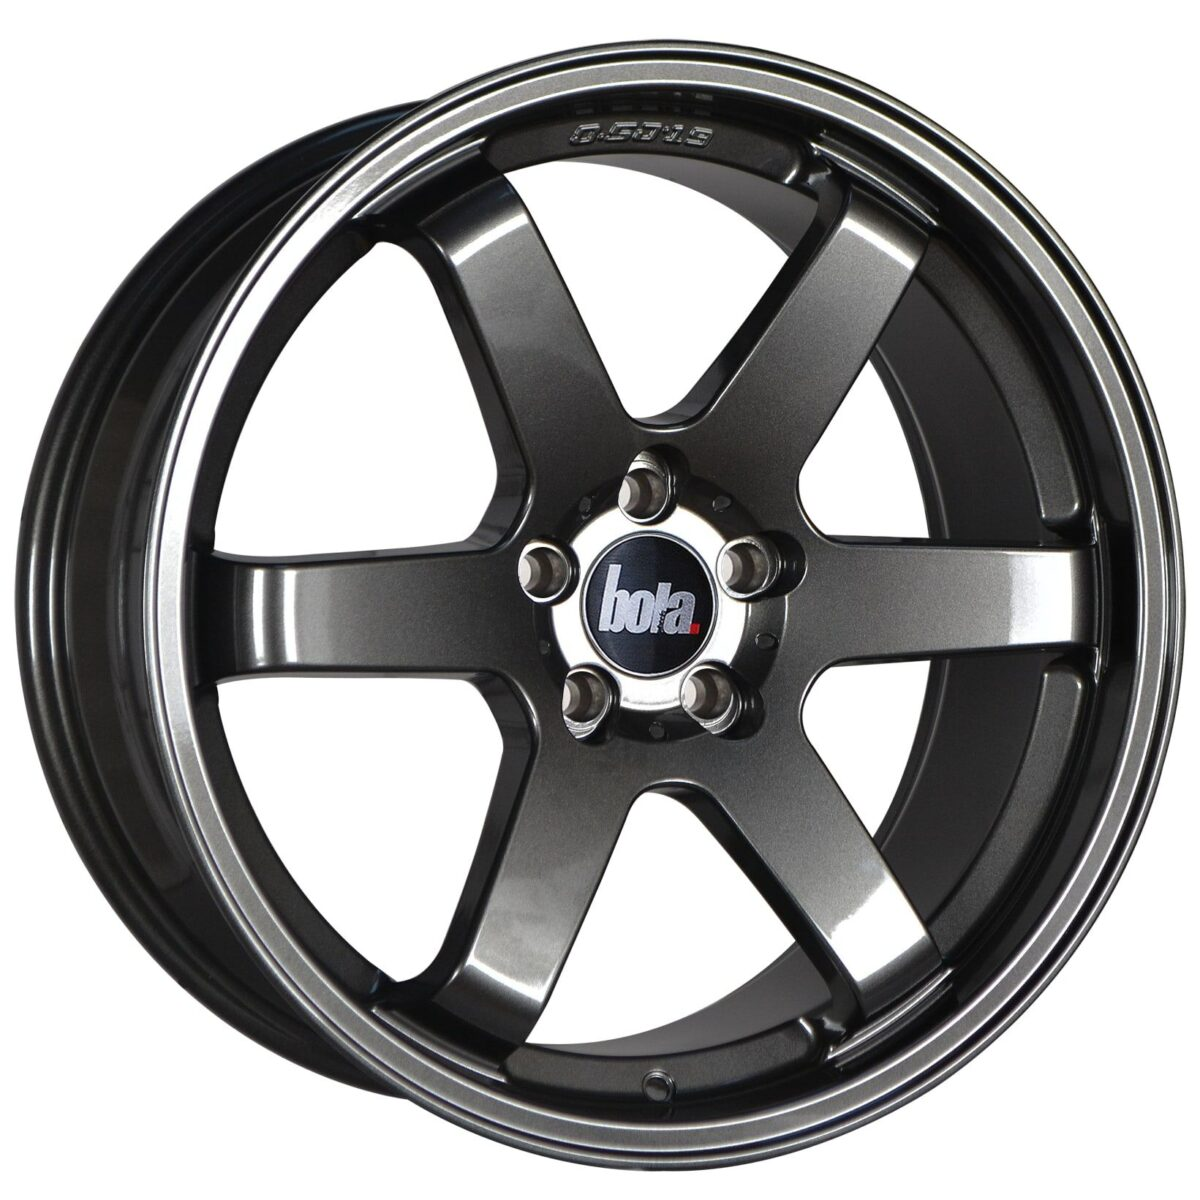 "19"" BOLA B1 Wheels - Gloss Gunmetal - VW / Audi / Mercedes - 5x112"